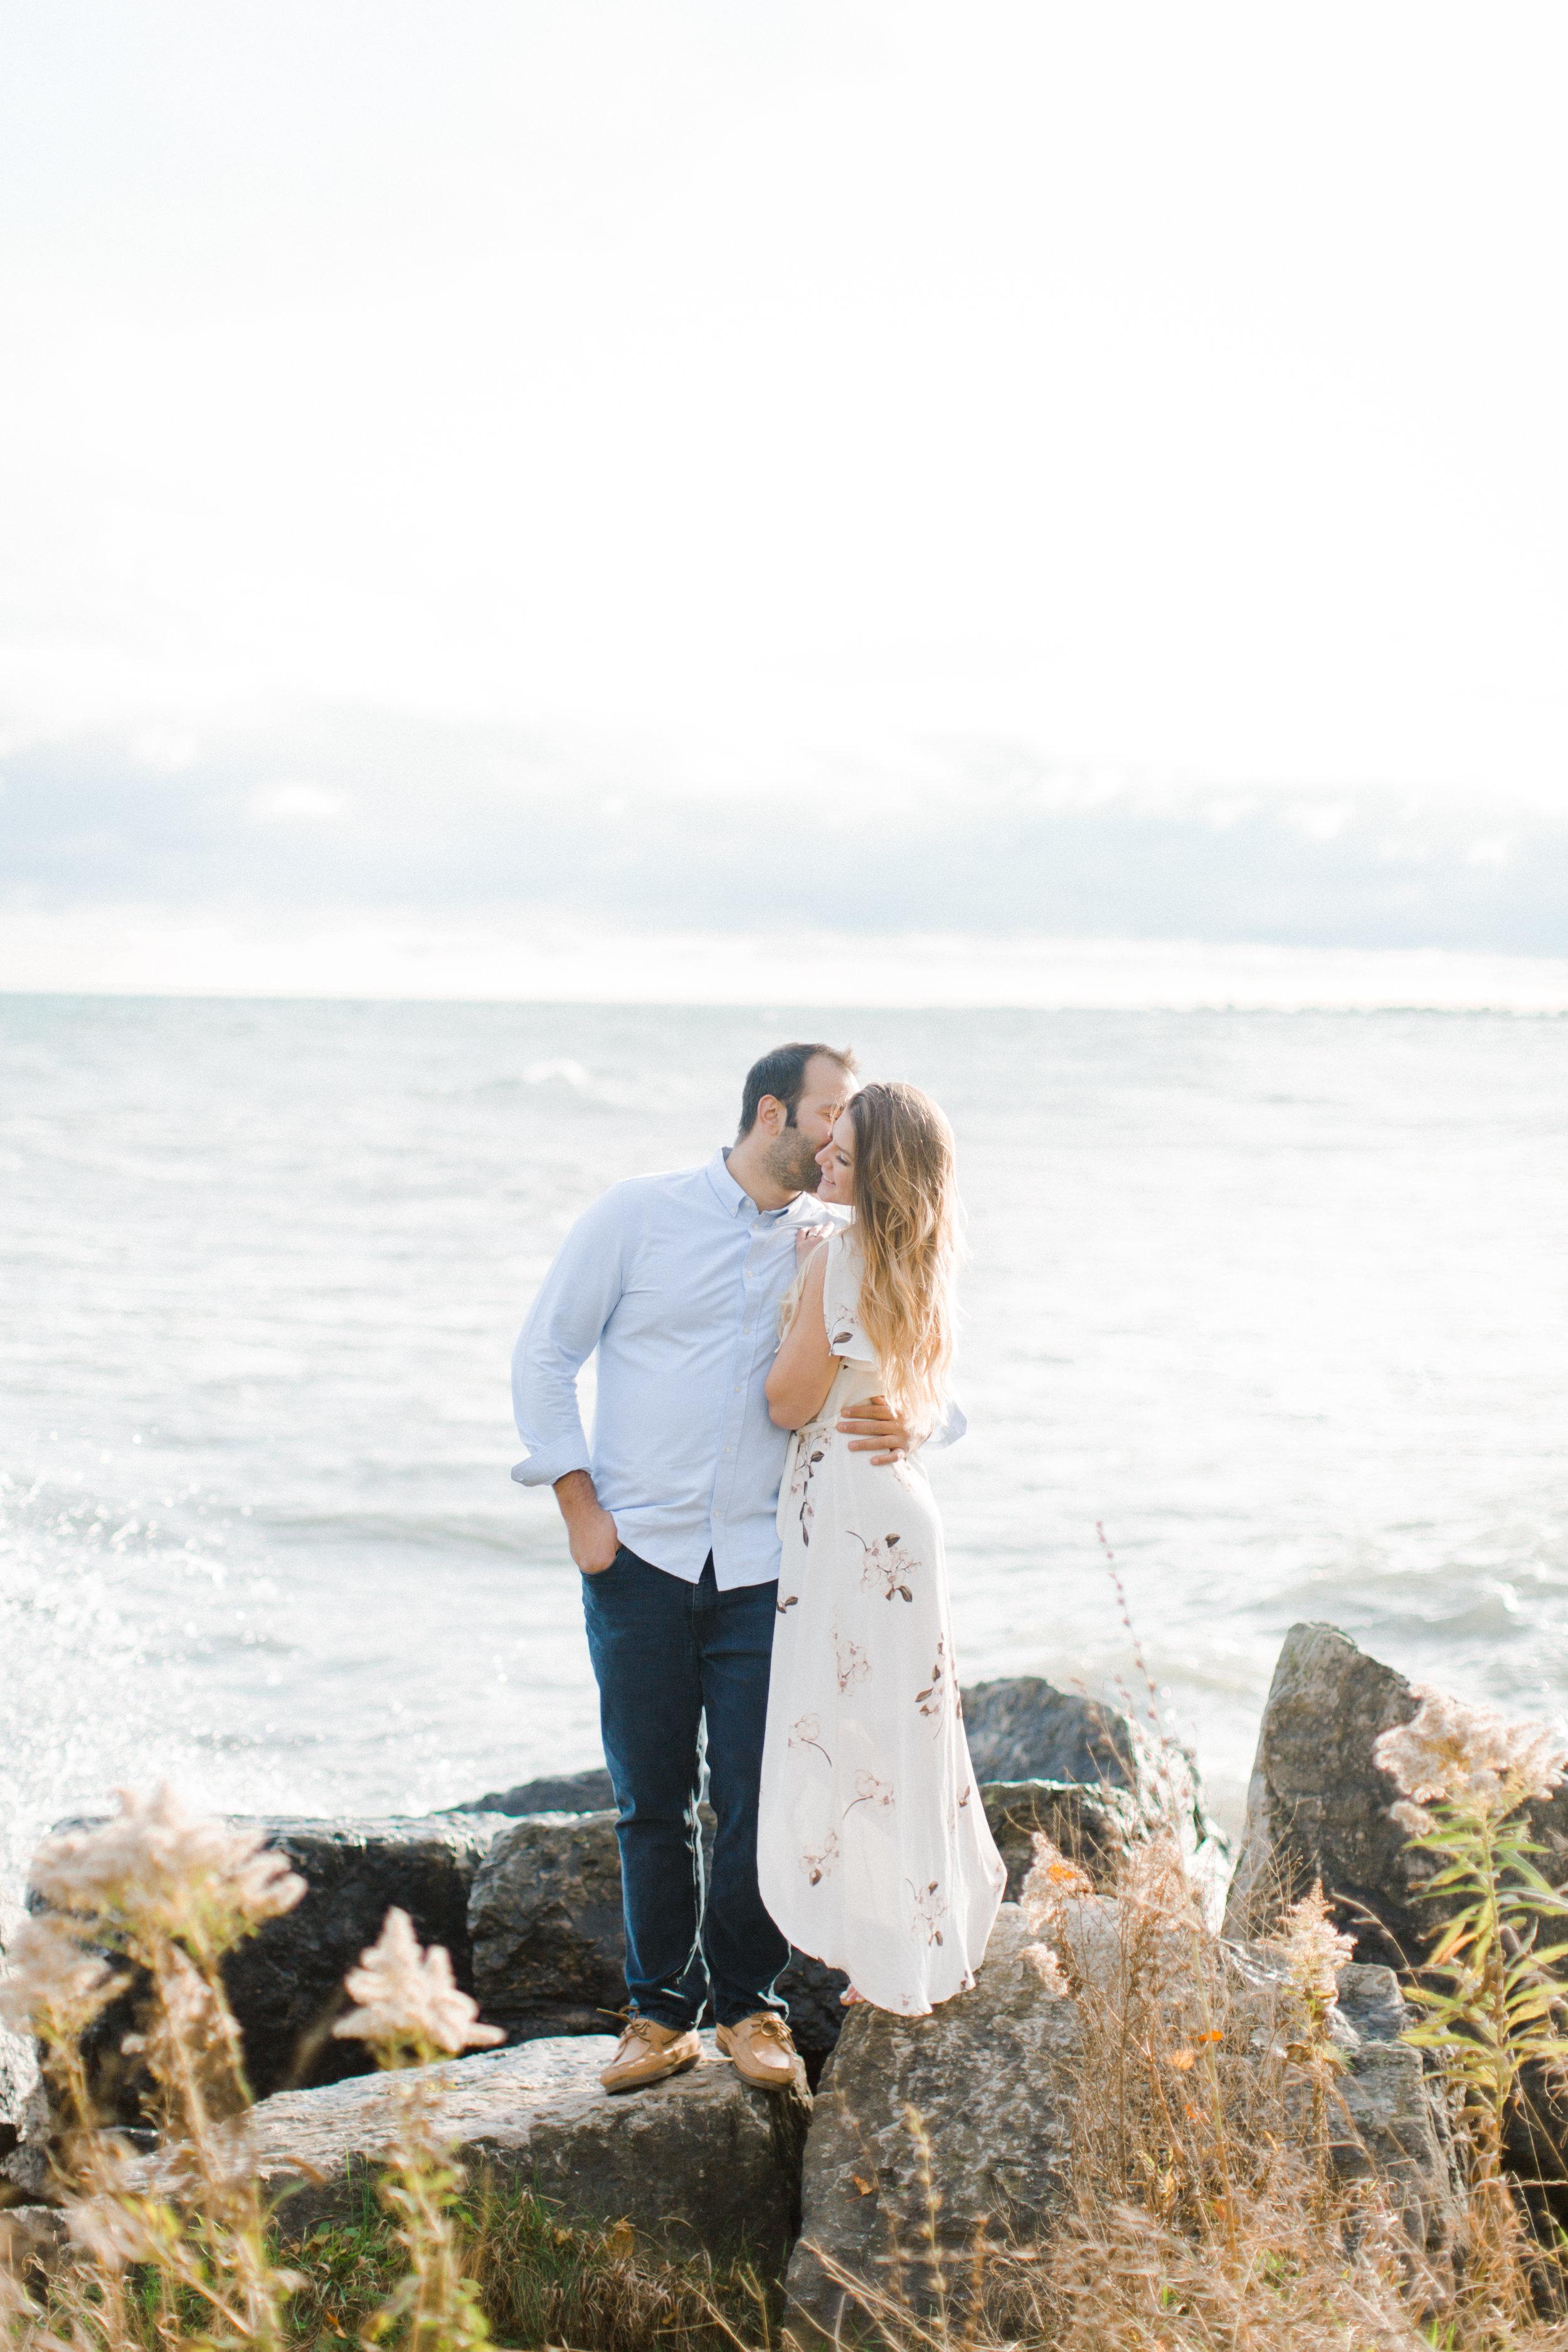 ashbridges-bay-toronto-wedding-photographer-soft-bright-pretty-pastel-richelle-hunter-lauren-miller-heather-chris-previews-3.jpg